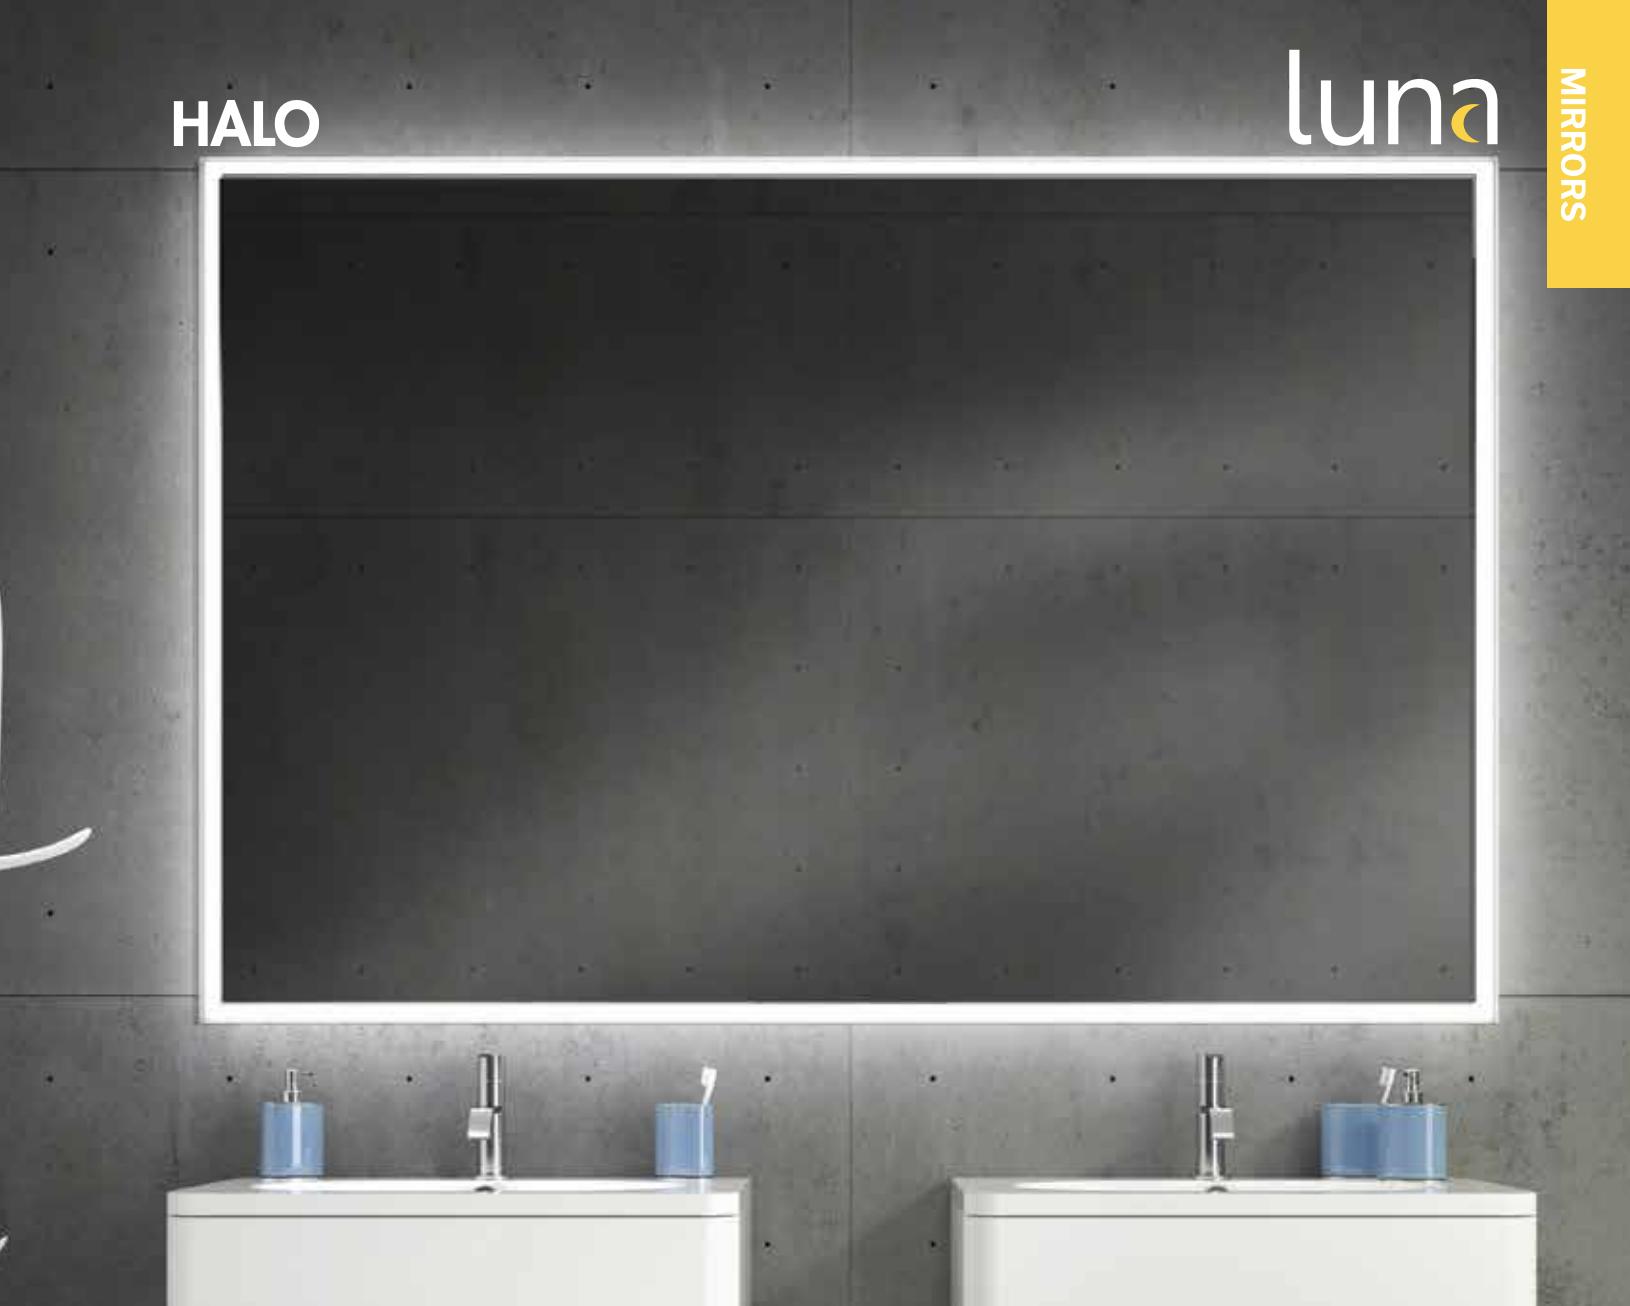 Fluerco halo lit mirrors